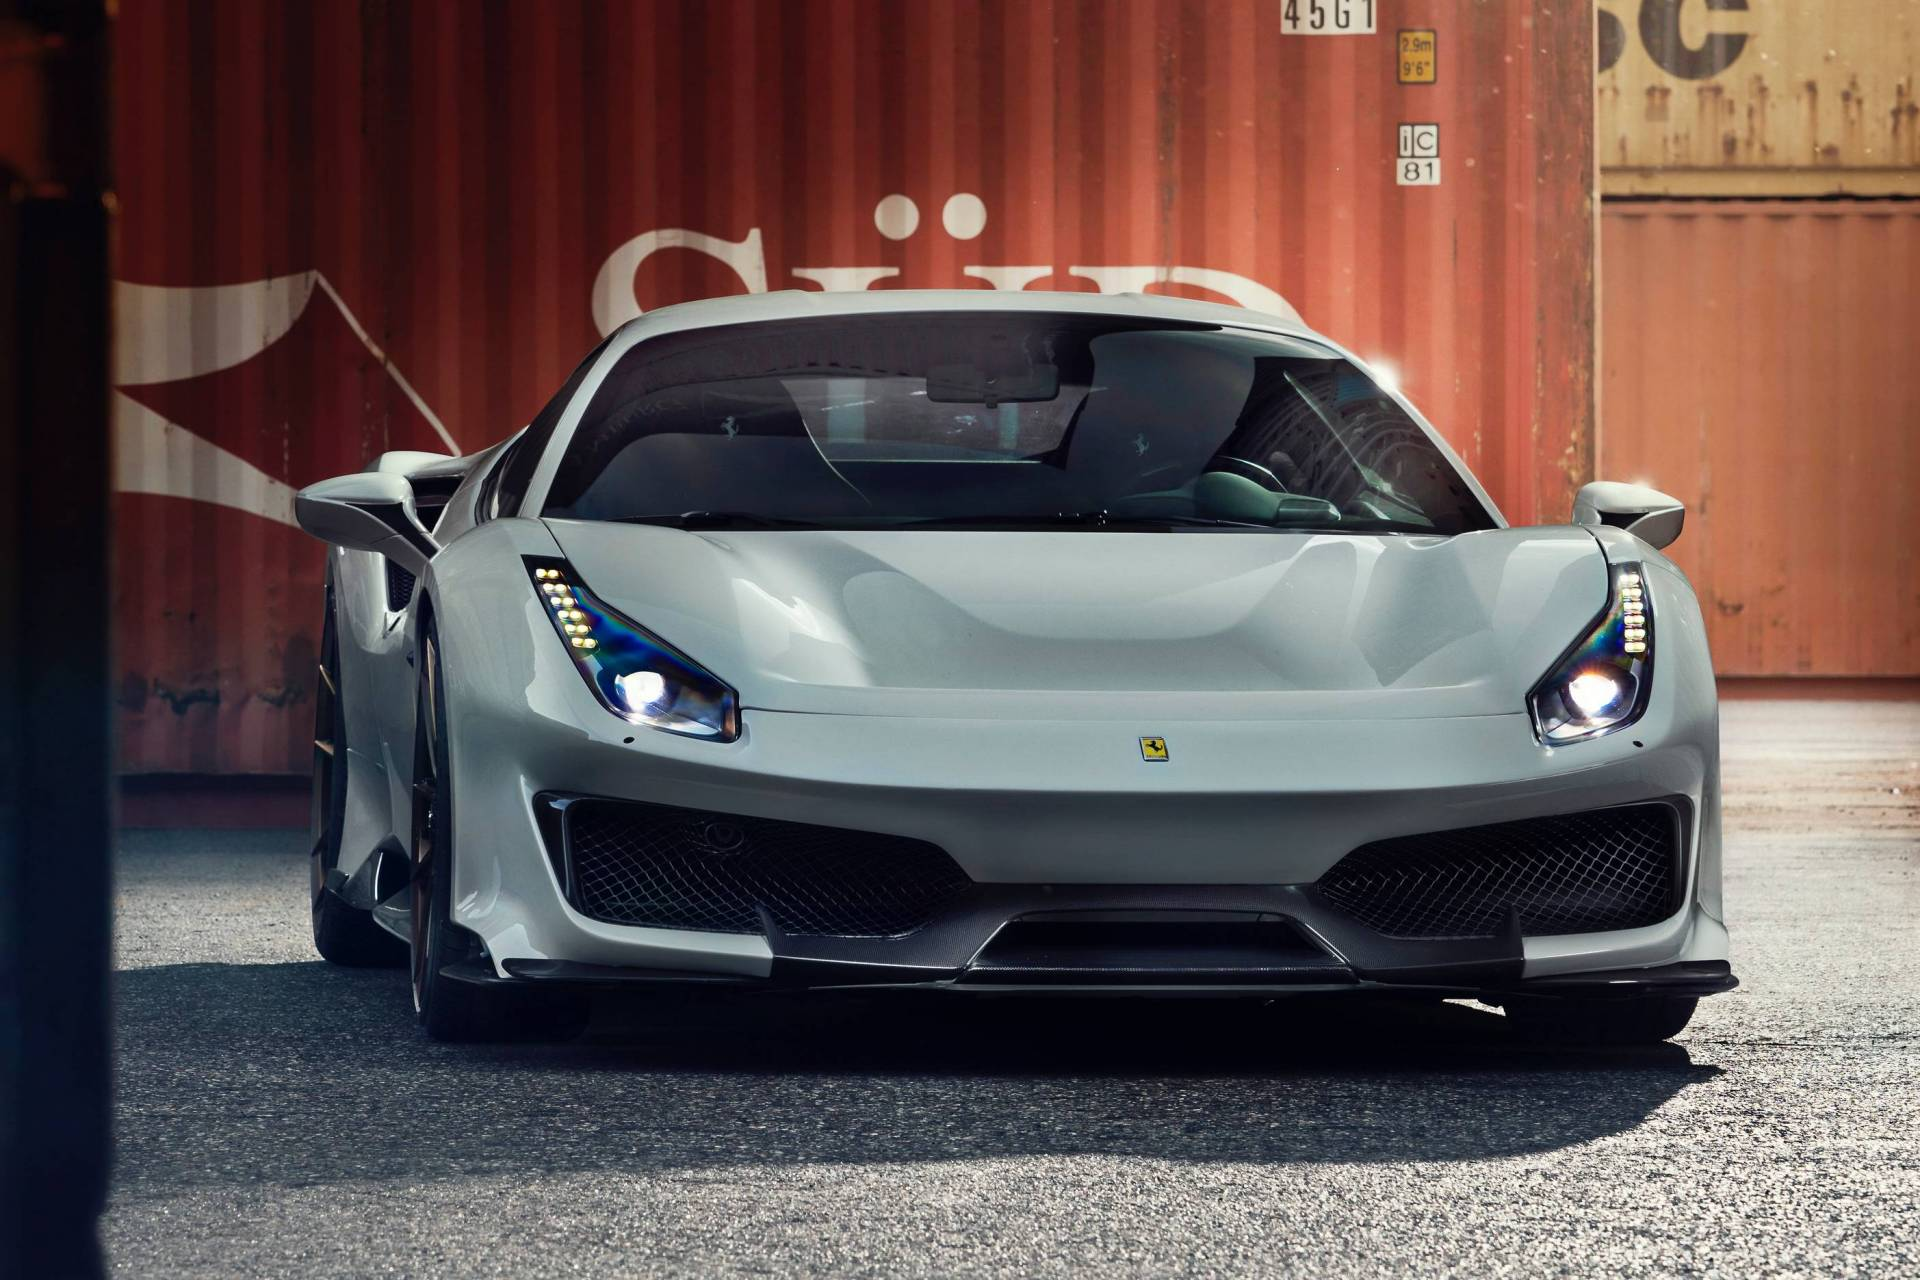 Ferrari-488-Pista-by-Novitec-3